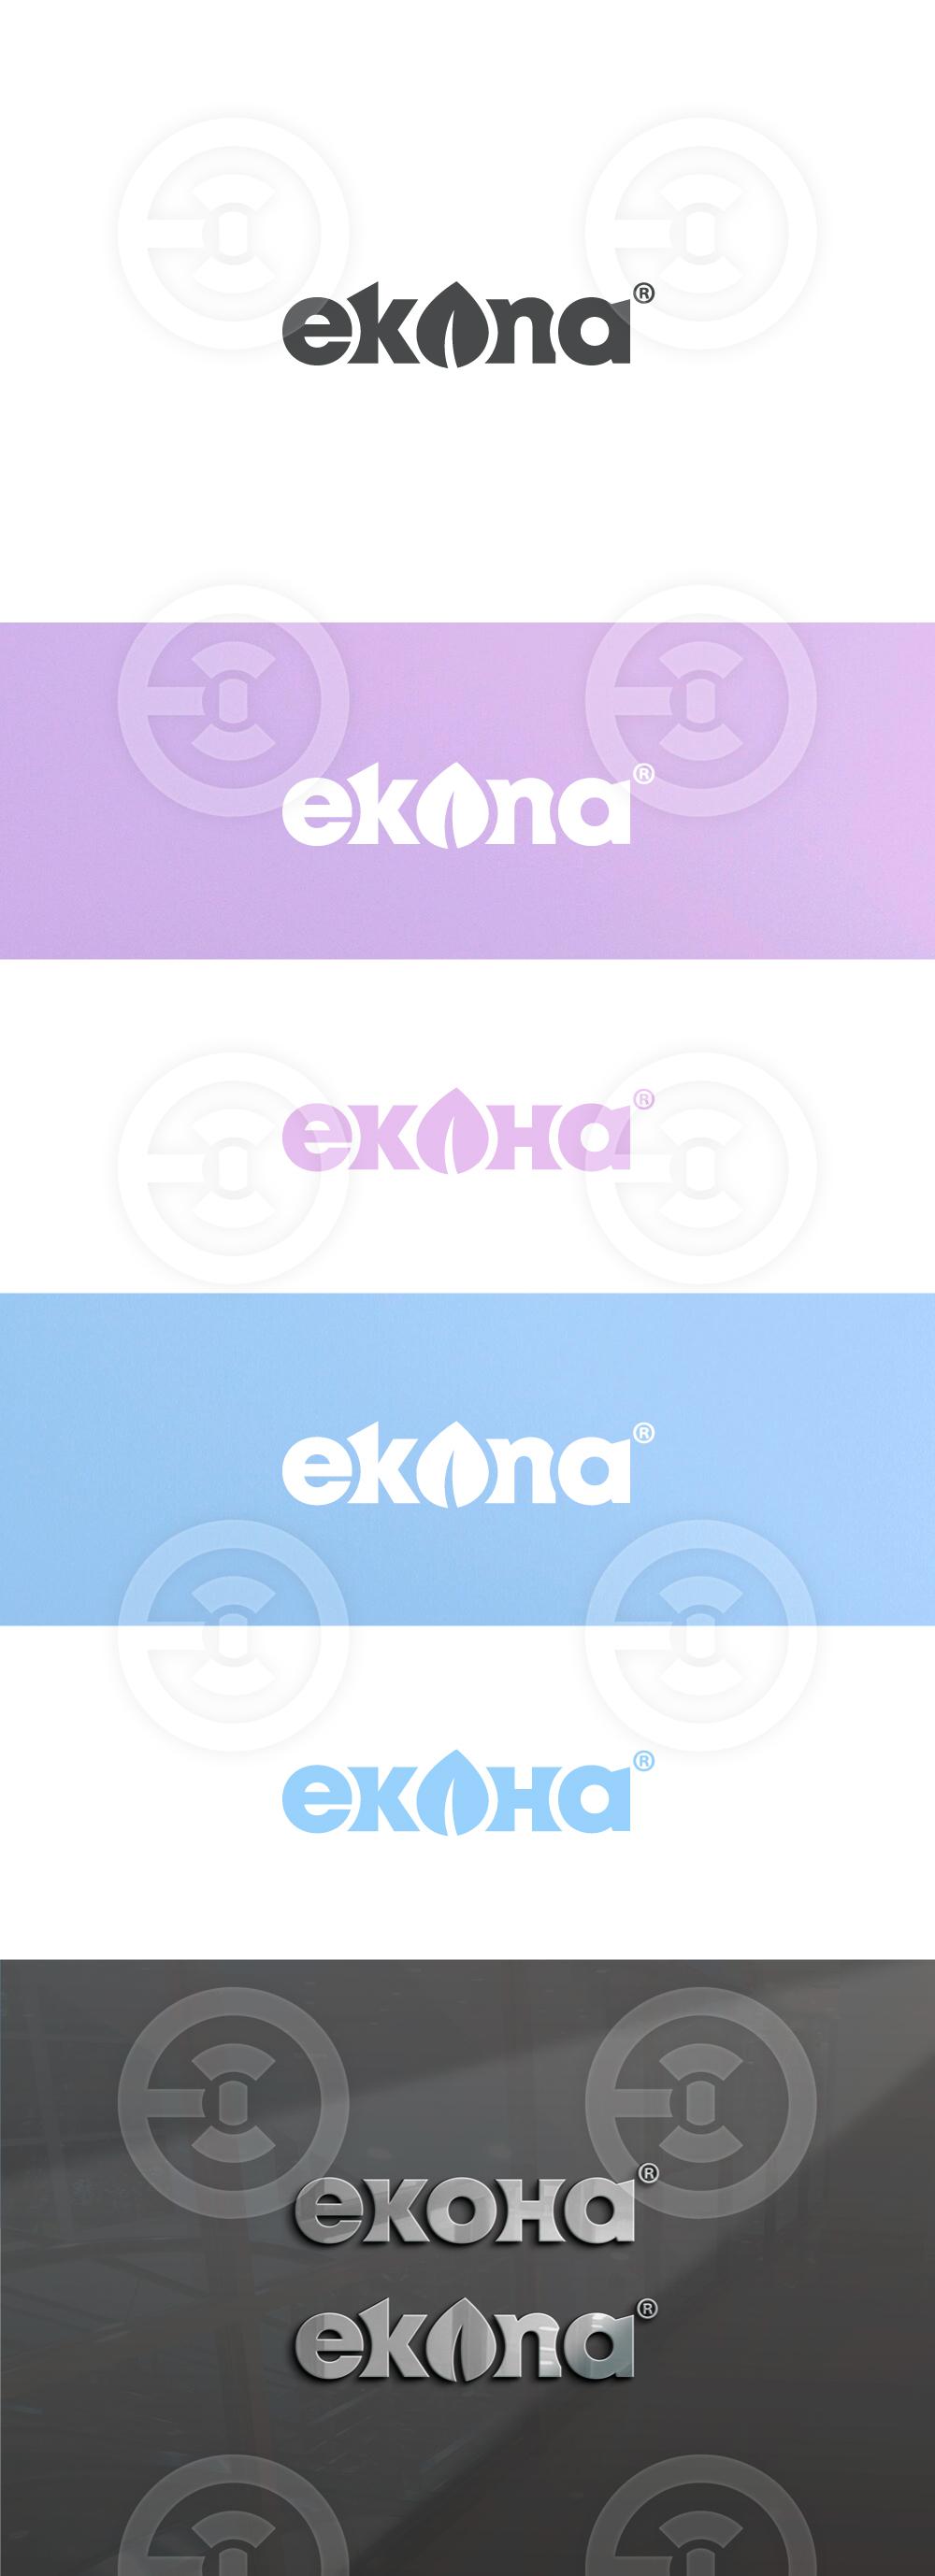 Ekona-1.jpg